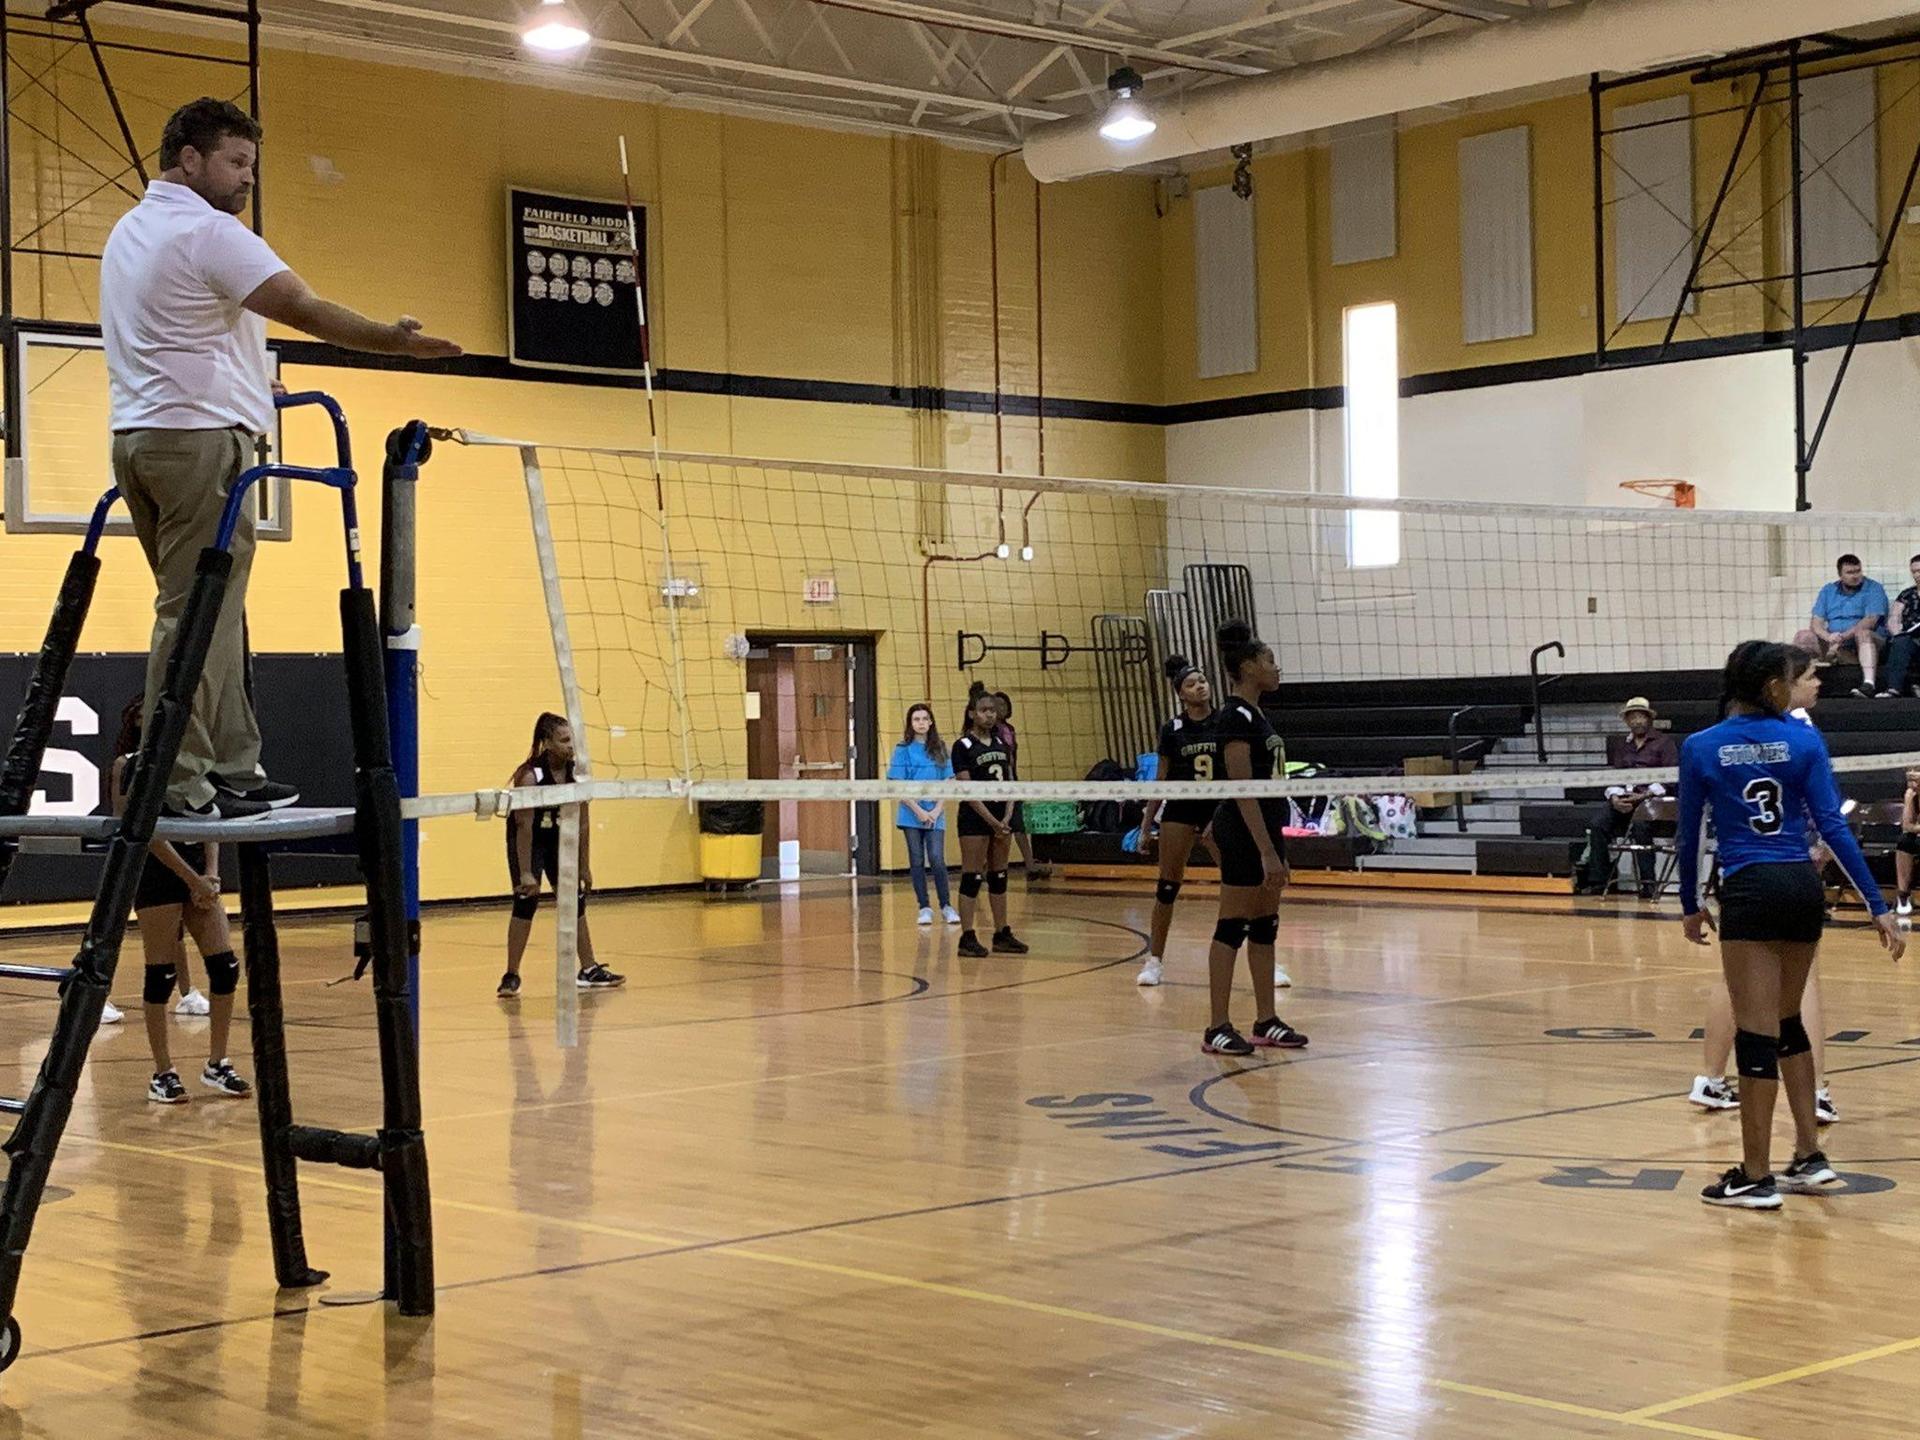 Girls' Volleyball Team behind the volleyball next.